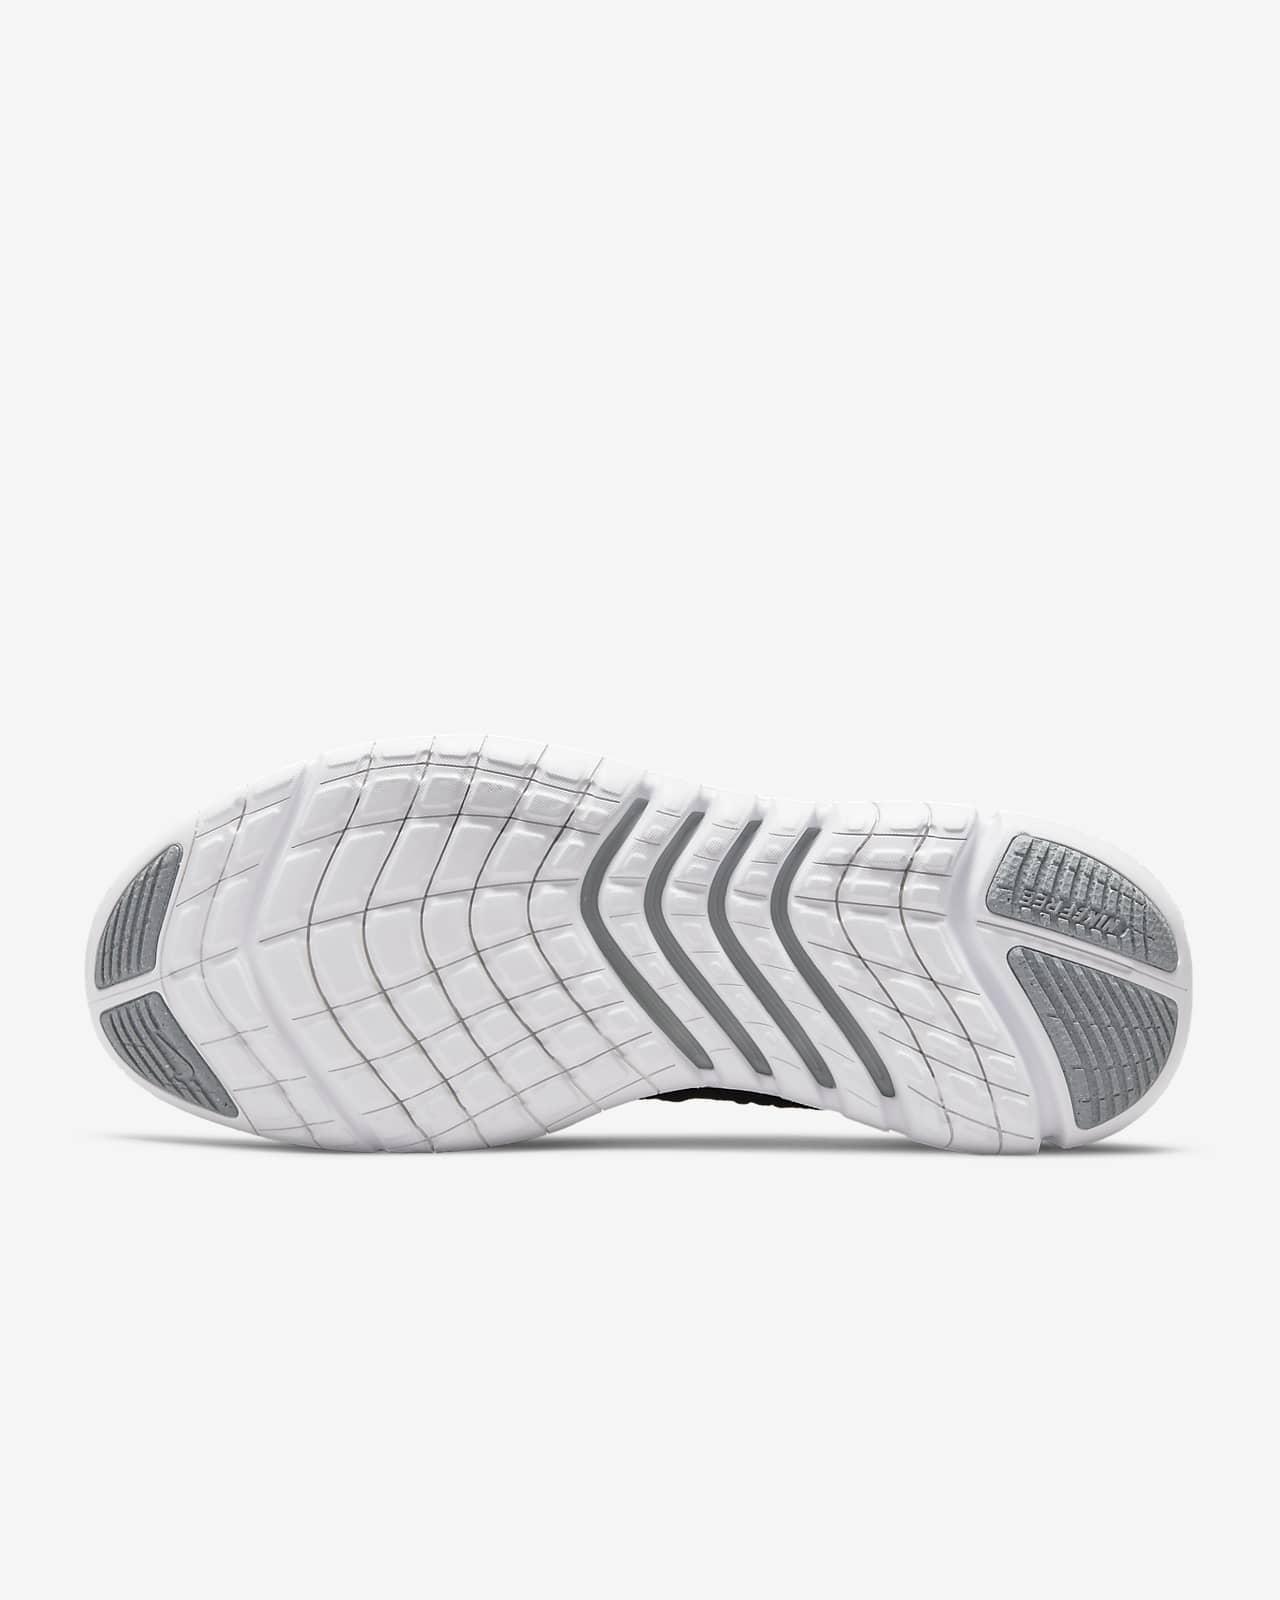 Nike Free Run 5.0 Men's Running Shoes. Nike SA